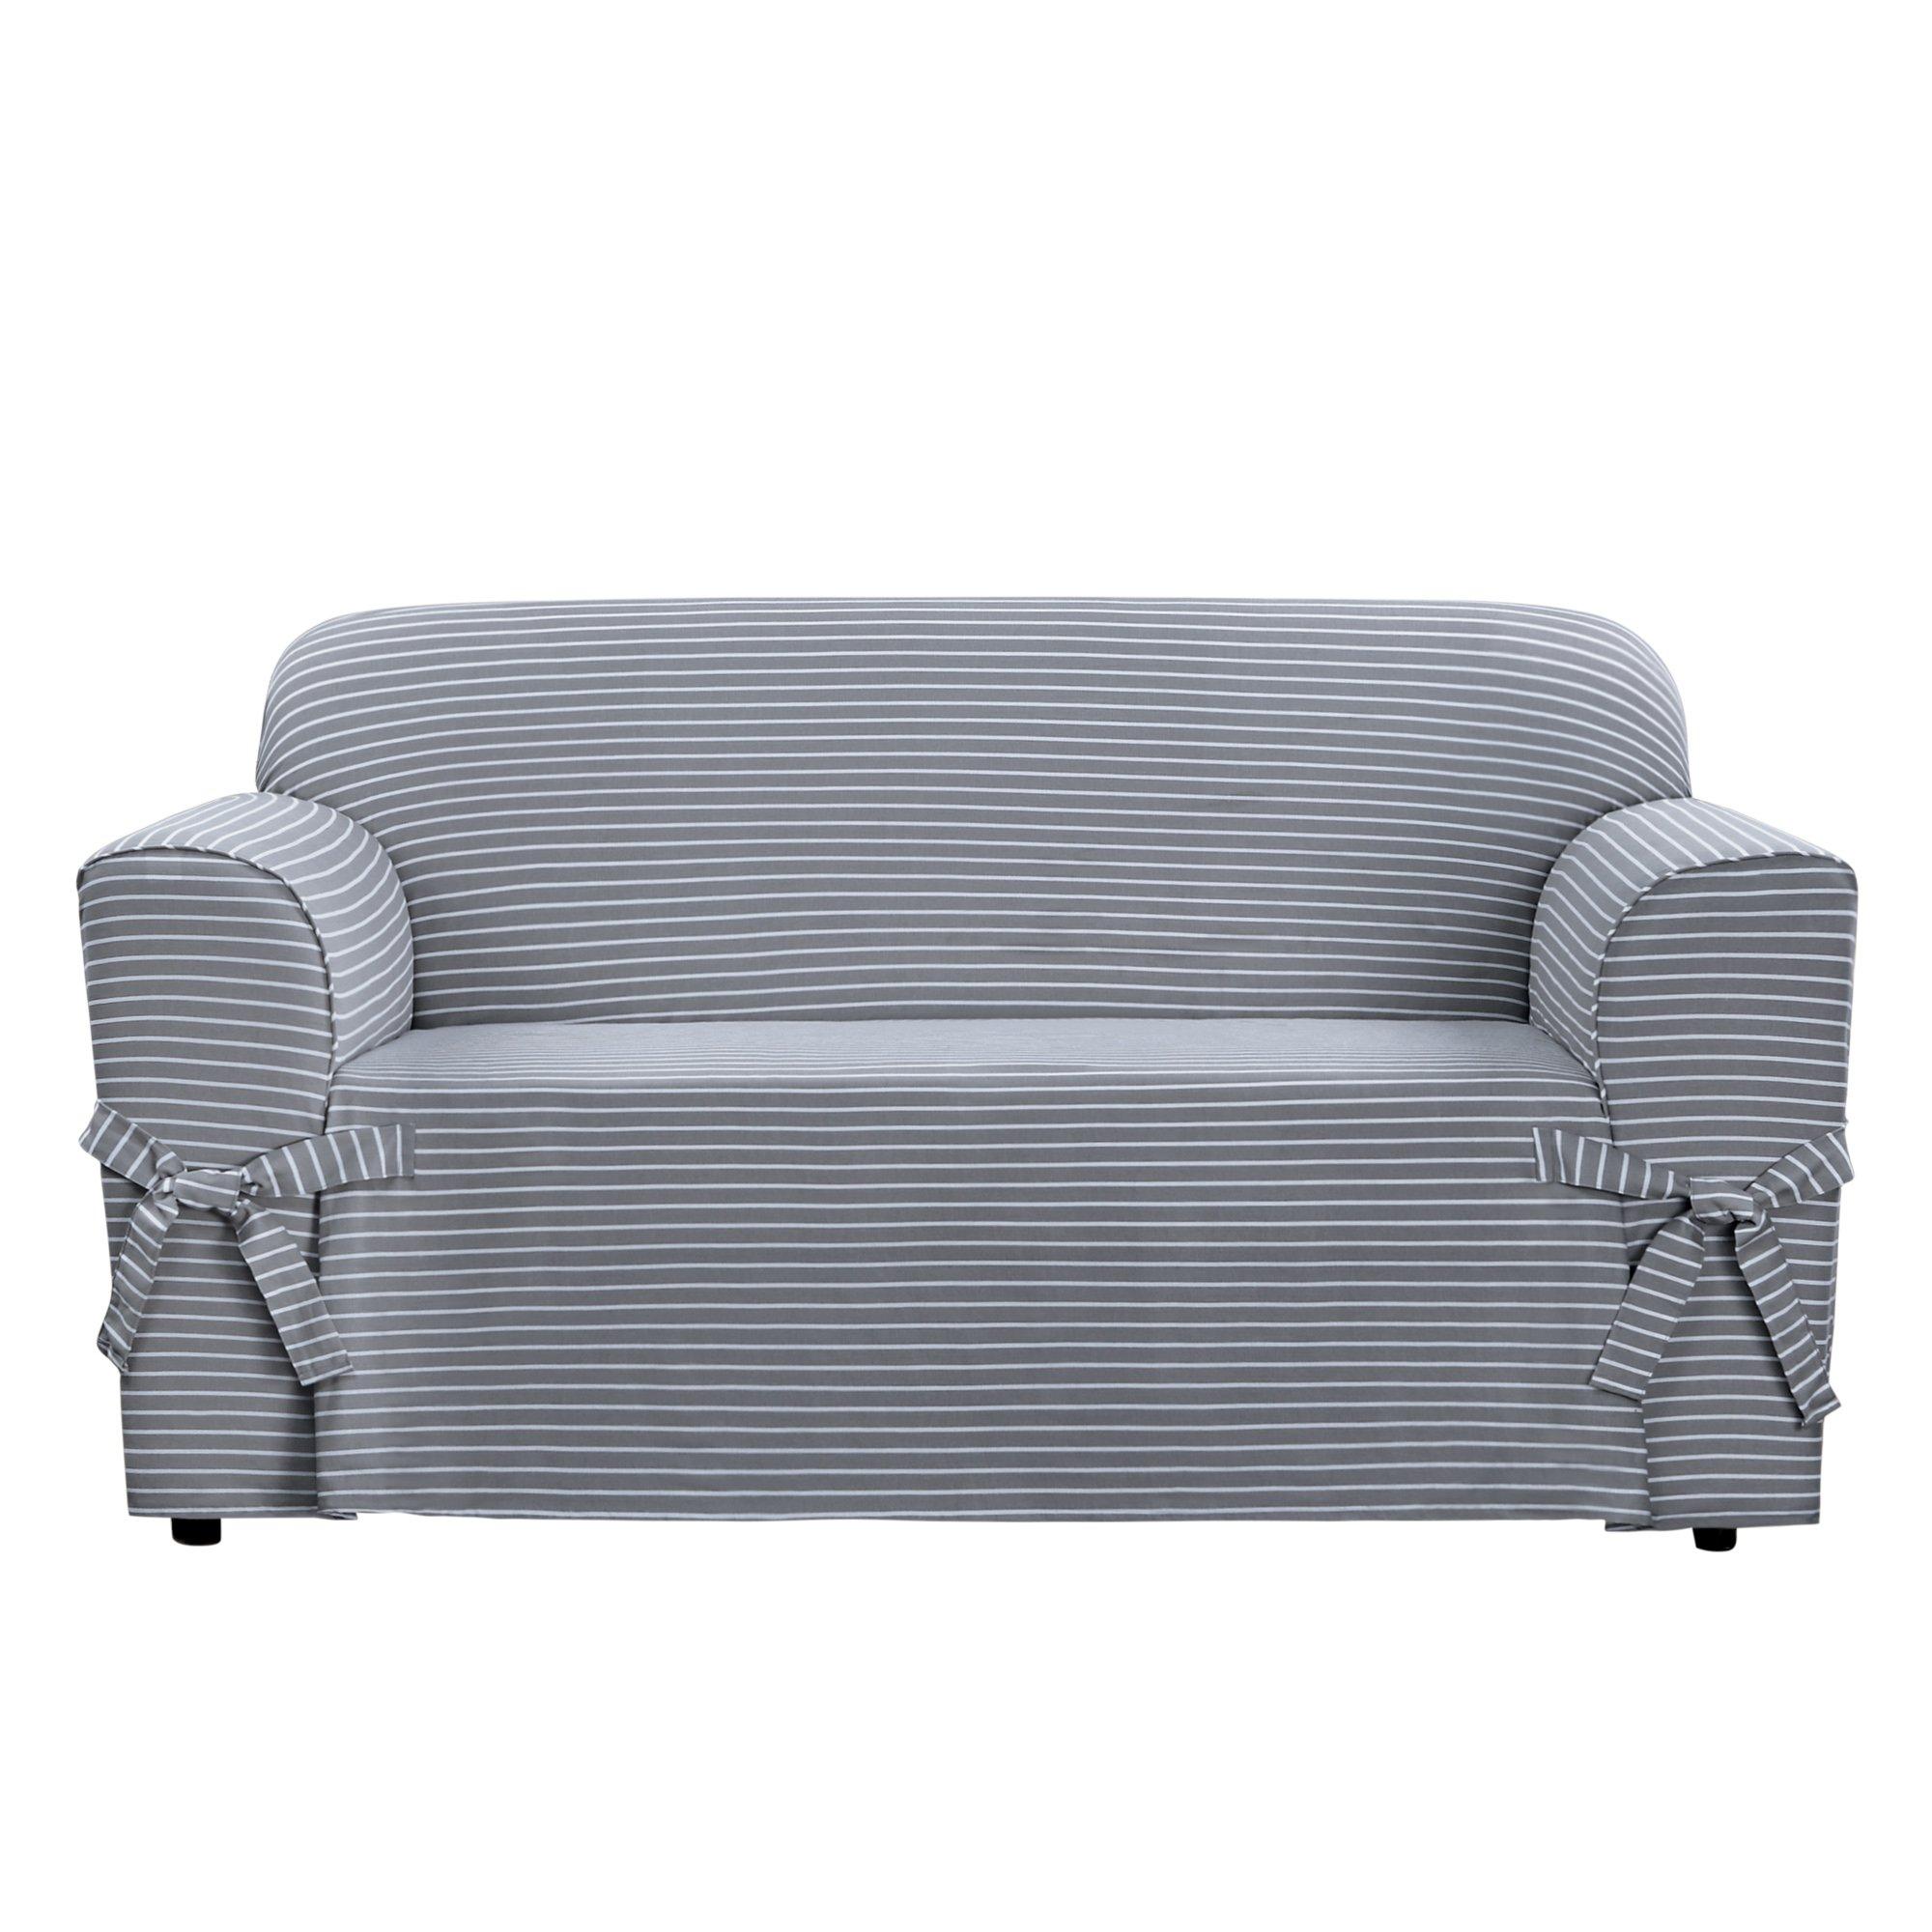 Sure Fit SF46204 Horizontal Club Stripe 100% Cotton 1 Piece Loveseat Slipcover, Limestone Gray by Surefit